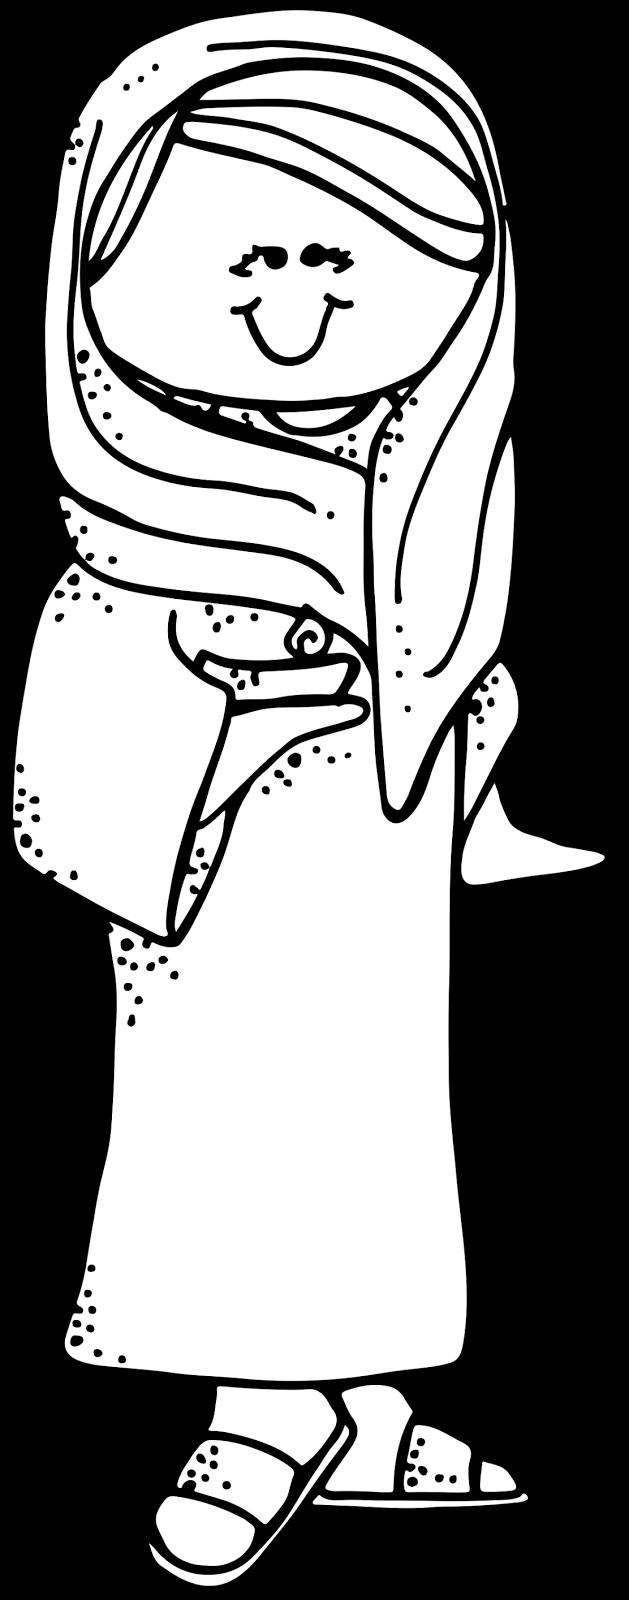 Melonheadz LDS illustrating: Virgin with oil lamp | estre ...